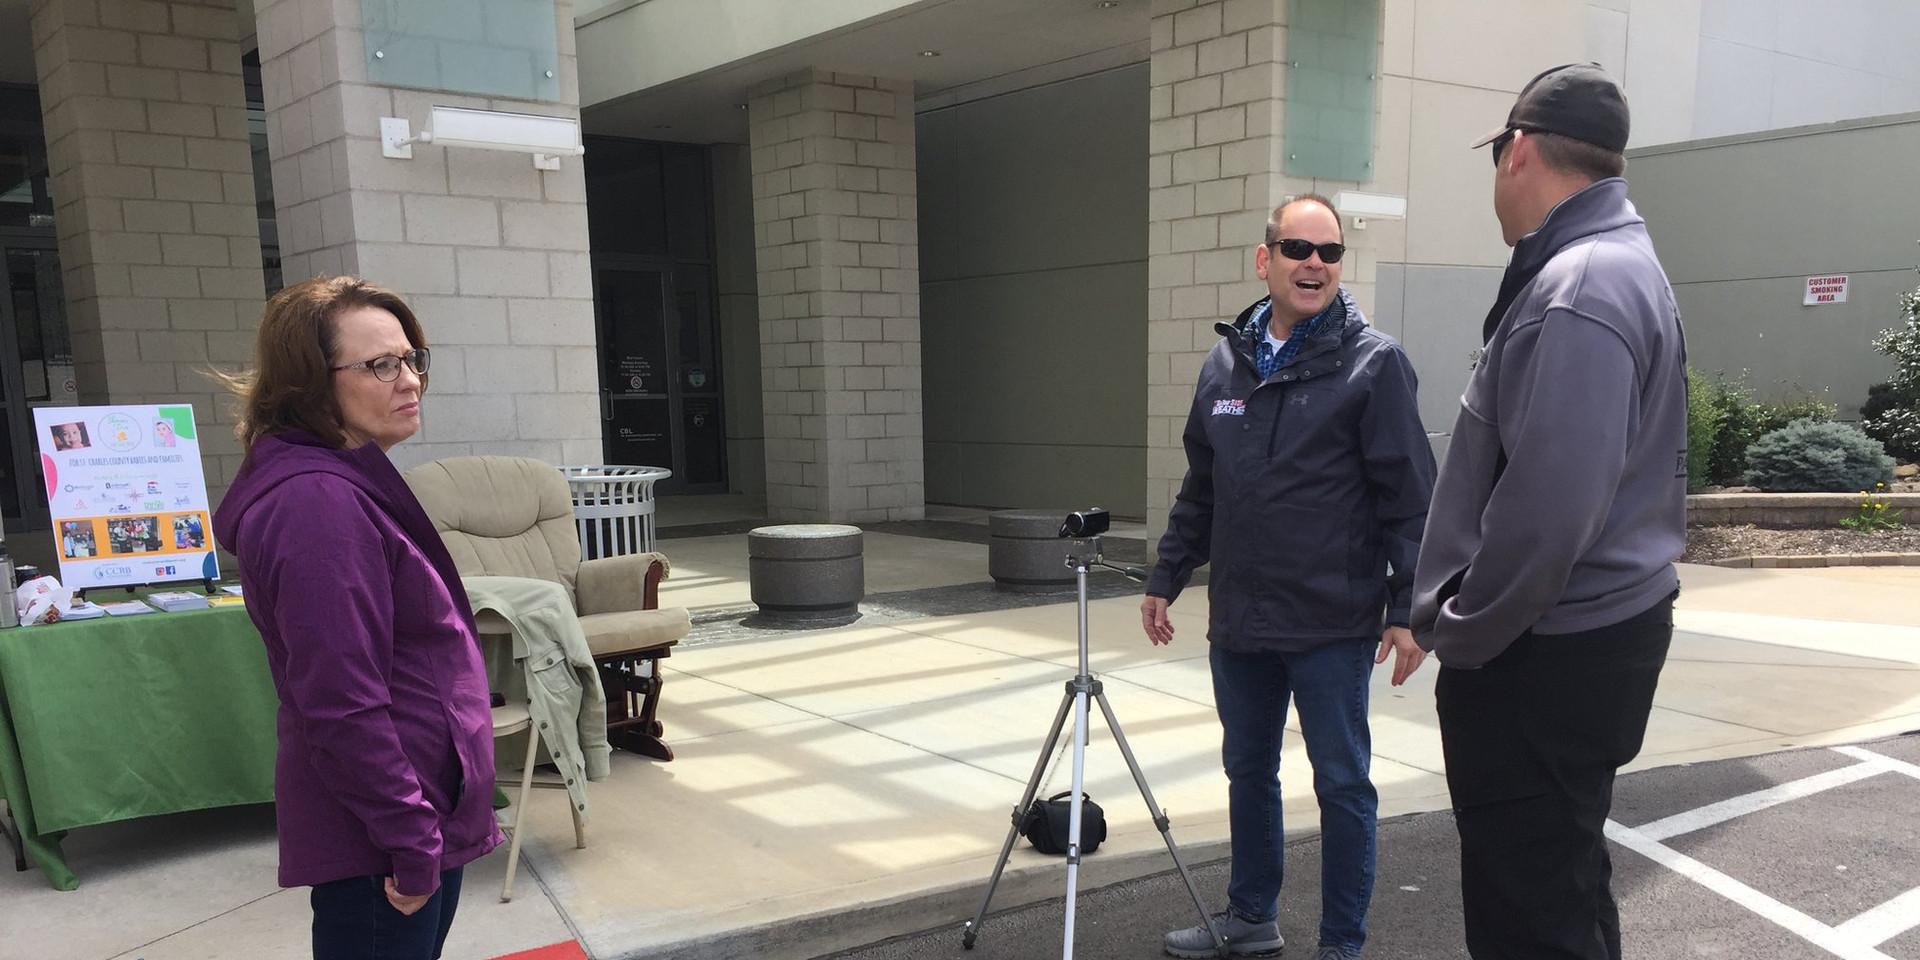 KSDK's Scott Cornell interviewing Kyle Gaines